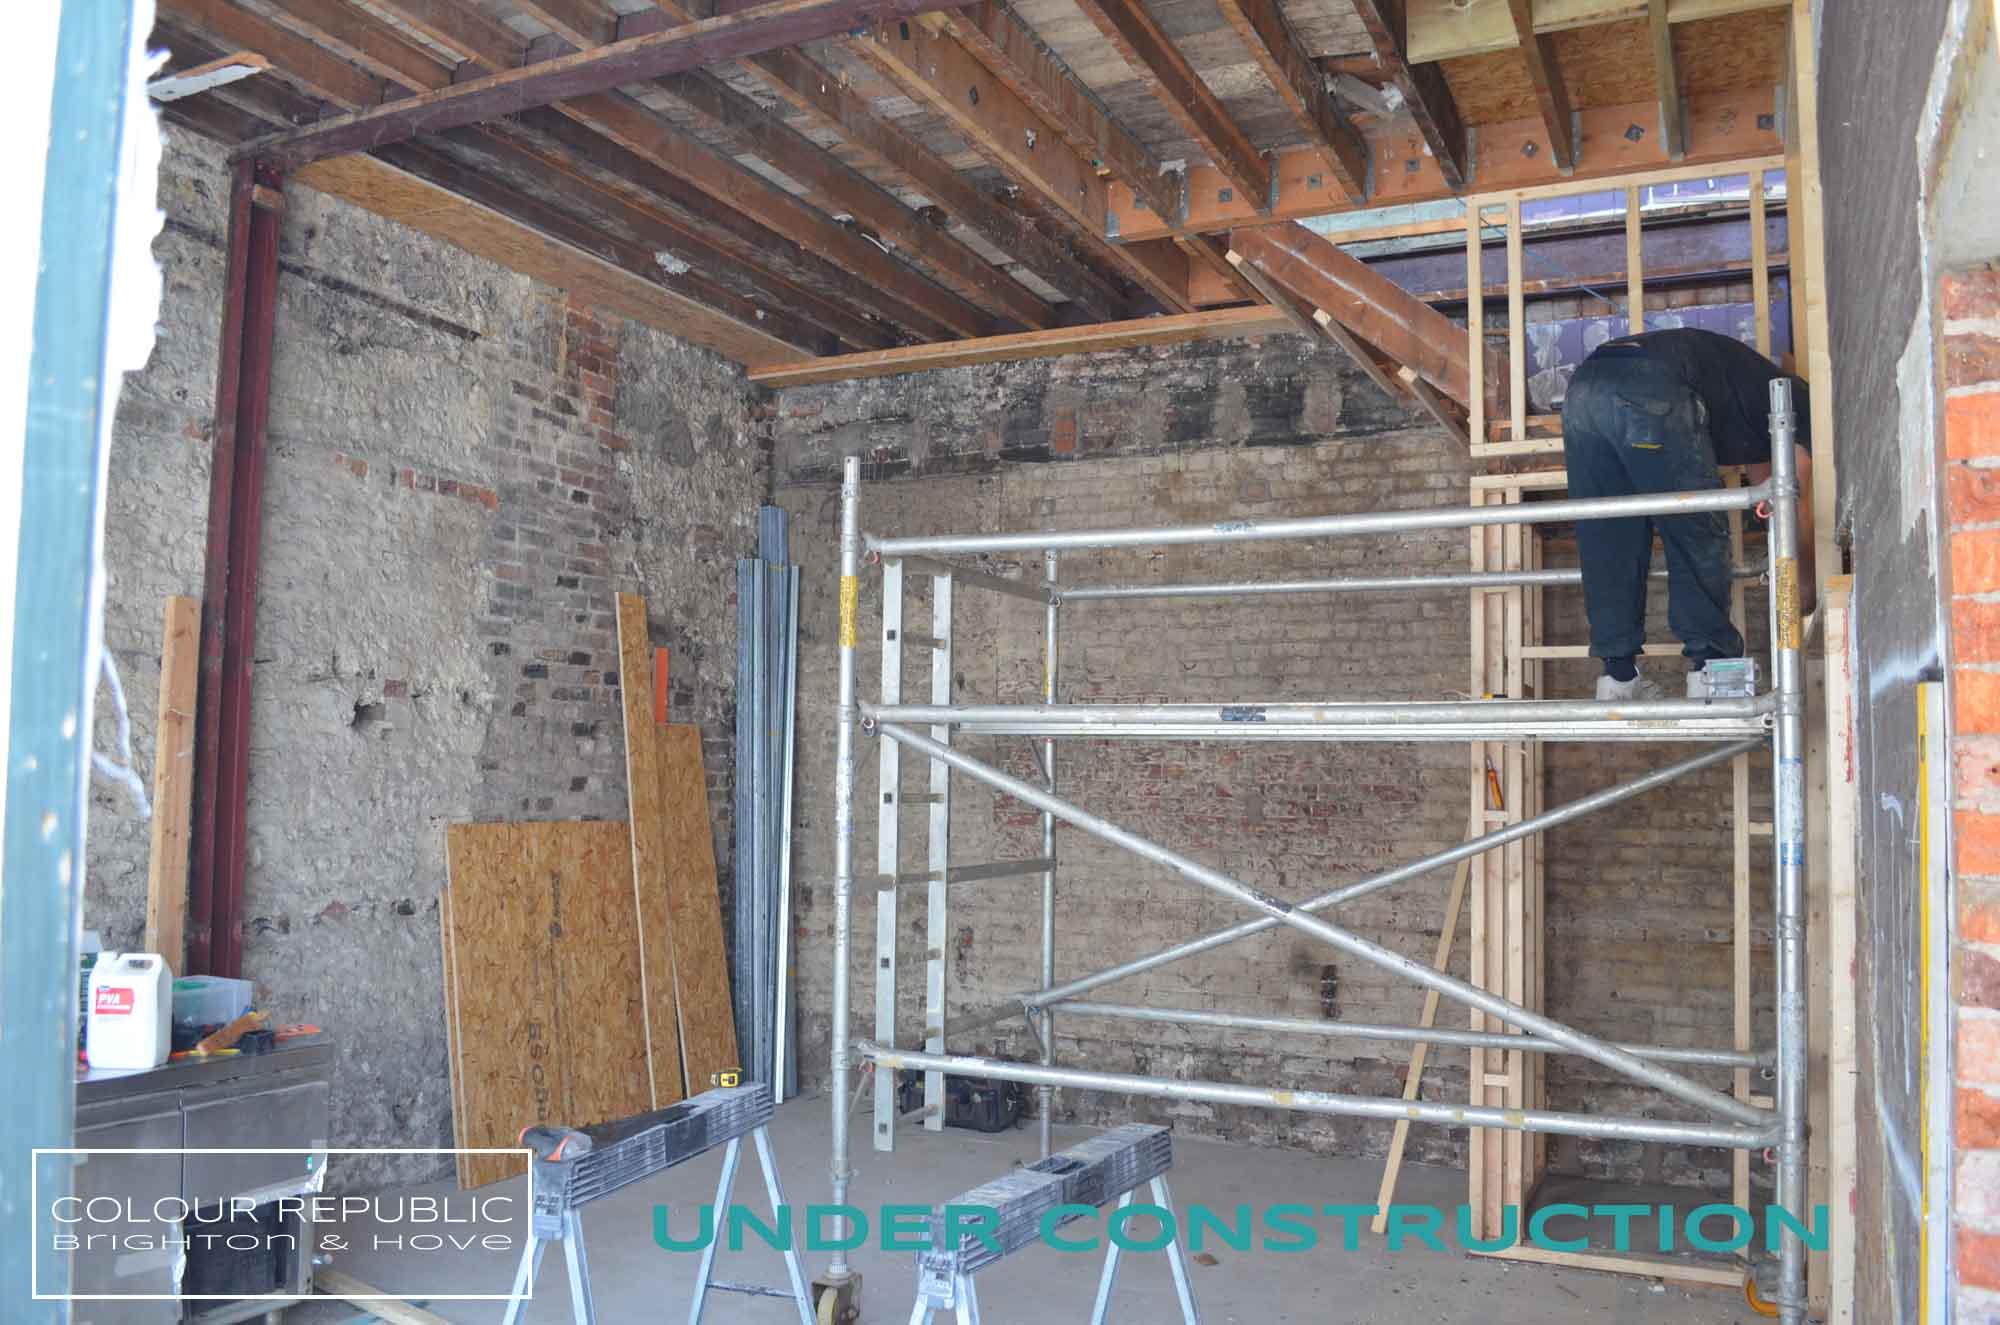 Building works in progress lounge